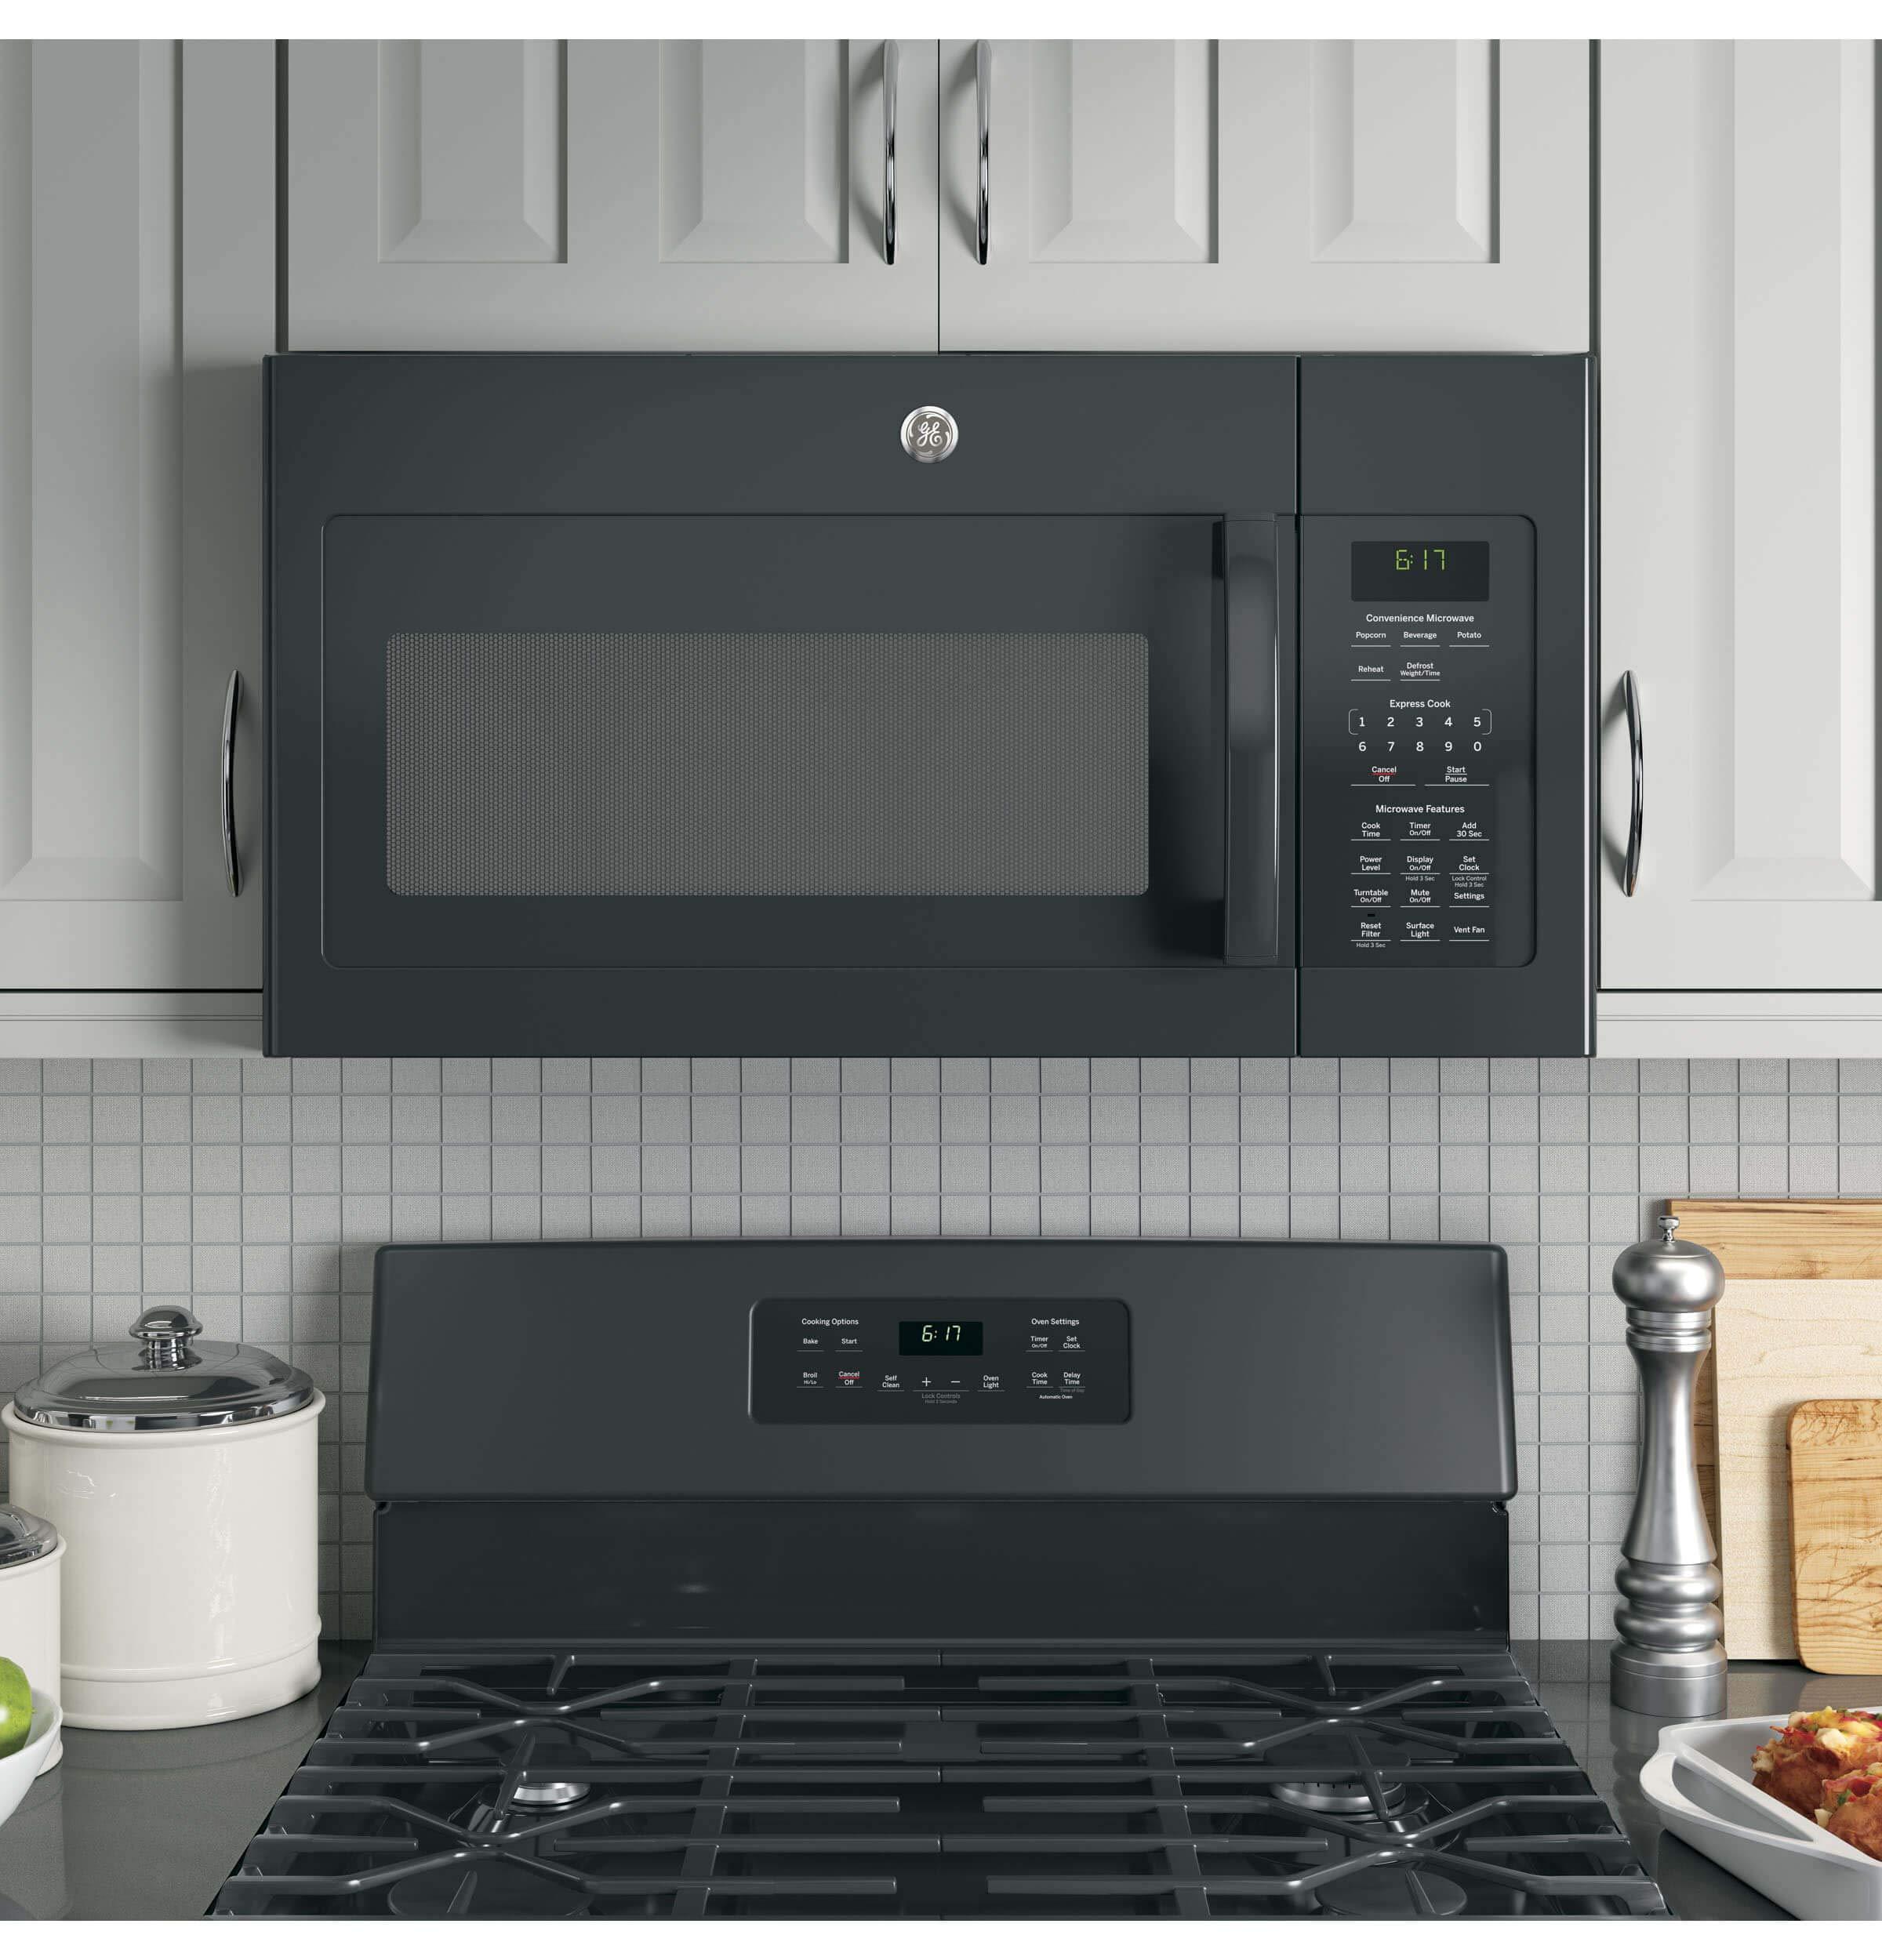 GE JVM6172DKBB Over-the- Over-the-Range Microwave, 1.7, Black by GE (Image #7)